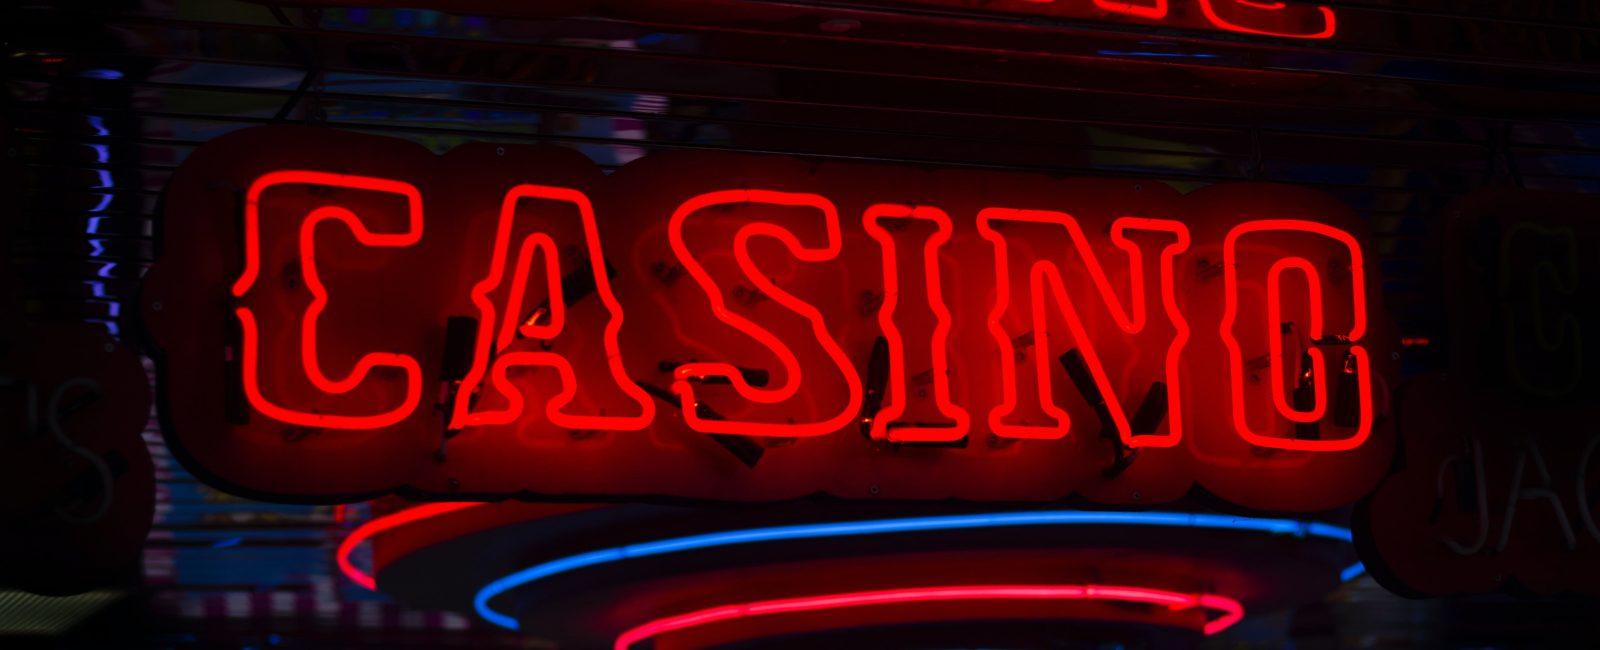 Online Casino Gaming: 8 Tips for Beginners